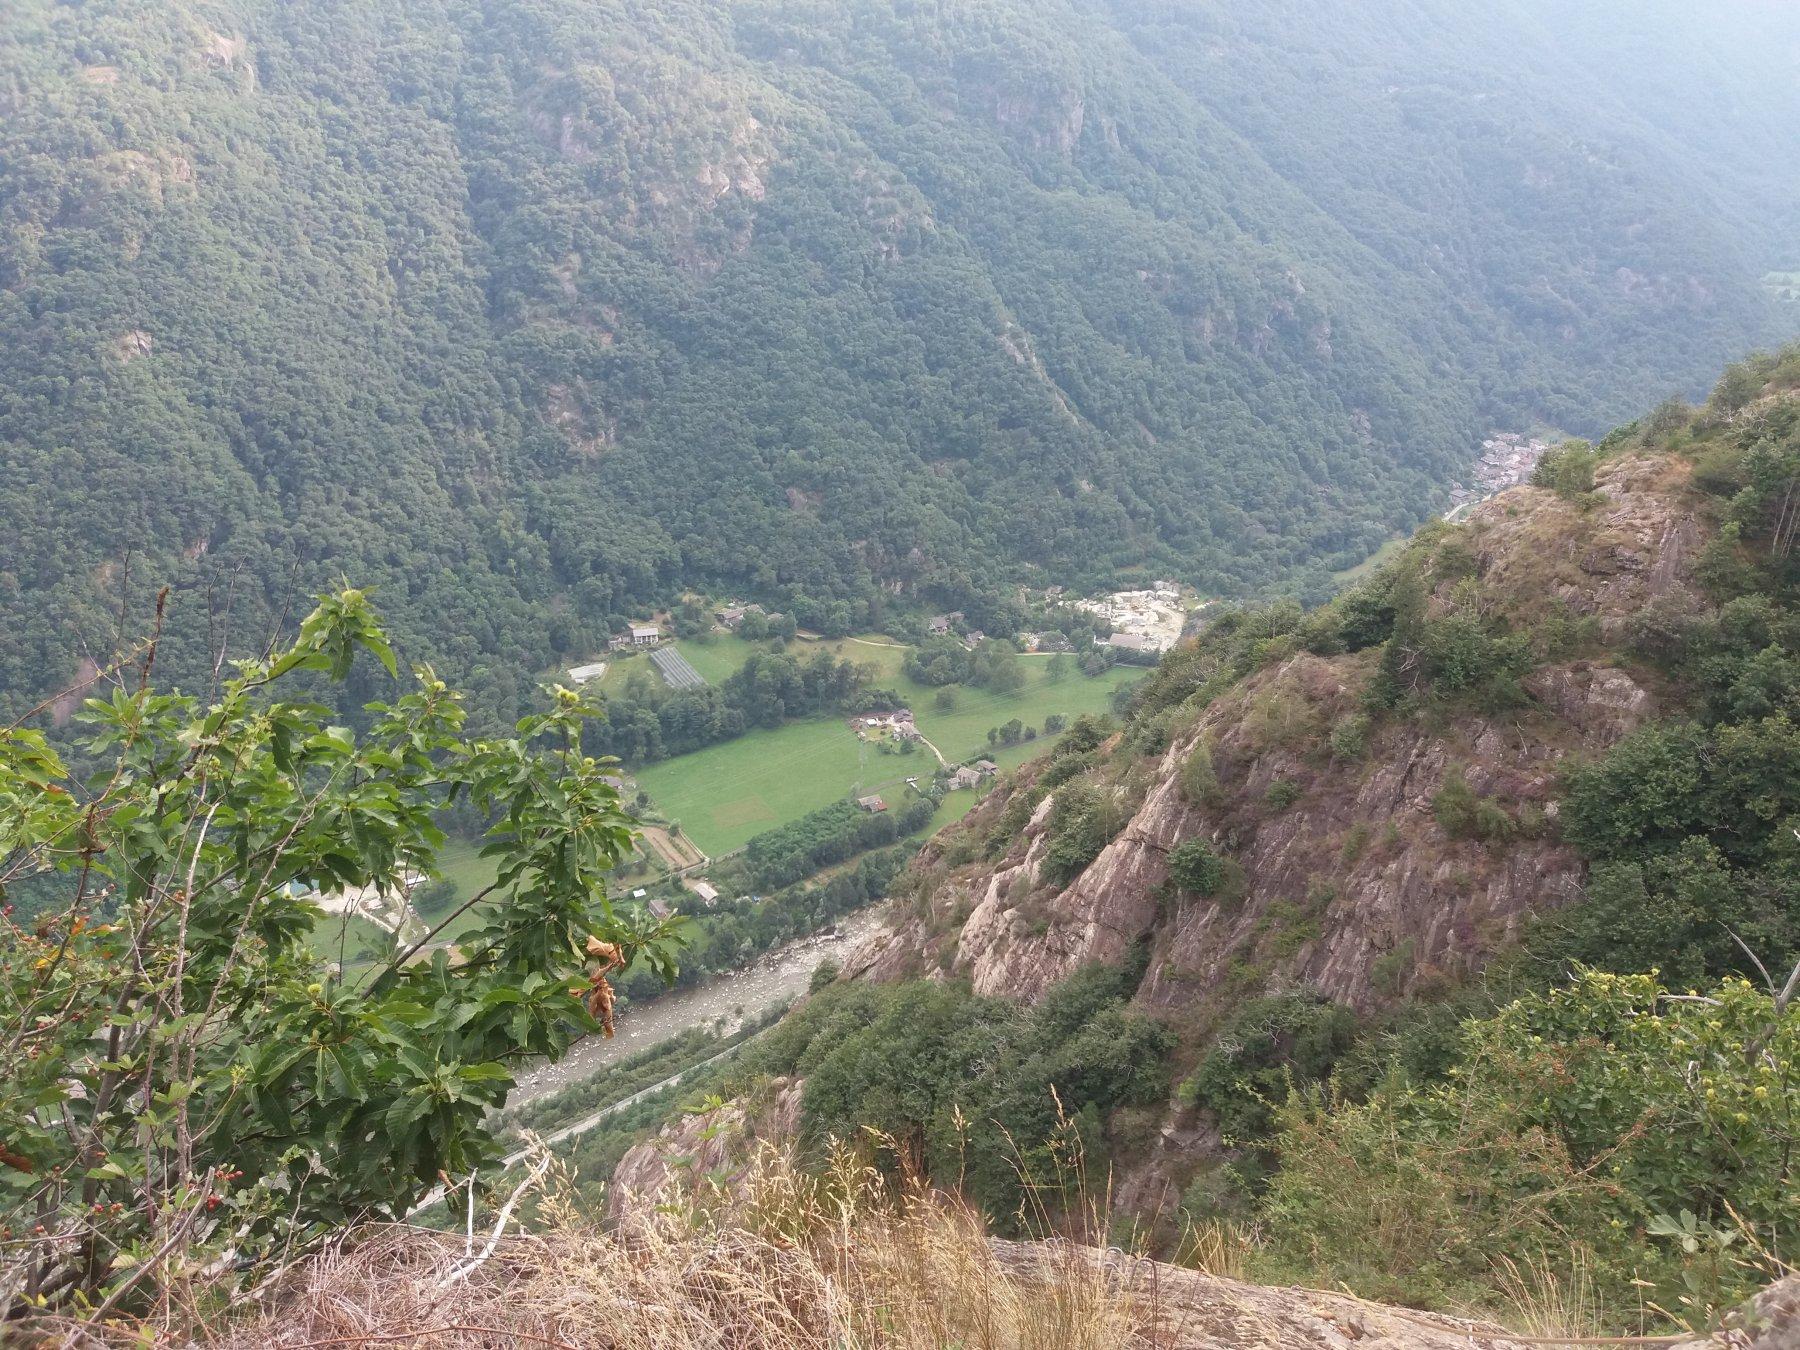 Vista a valle